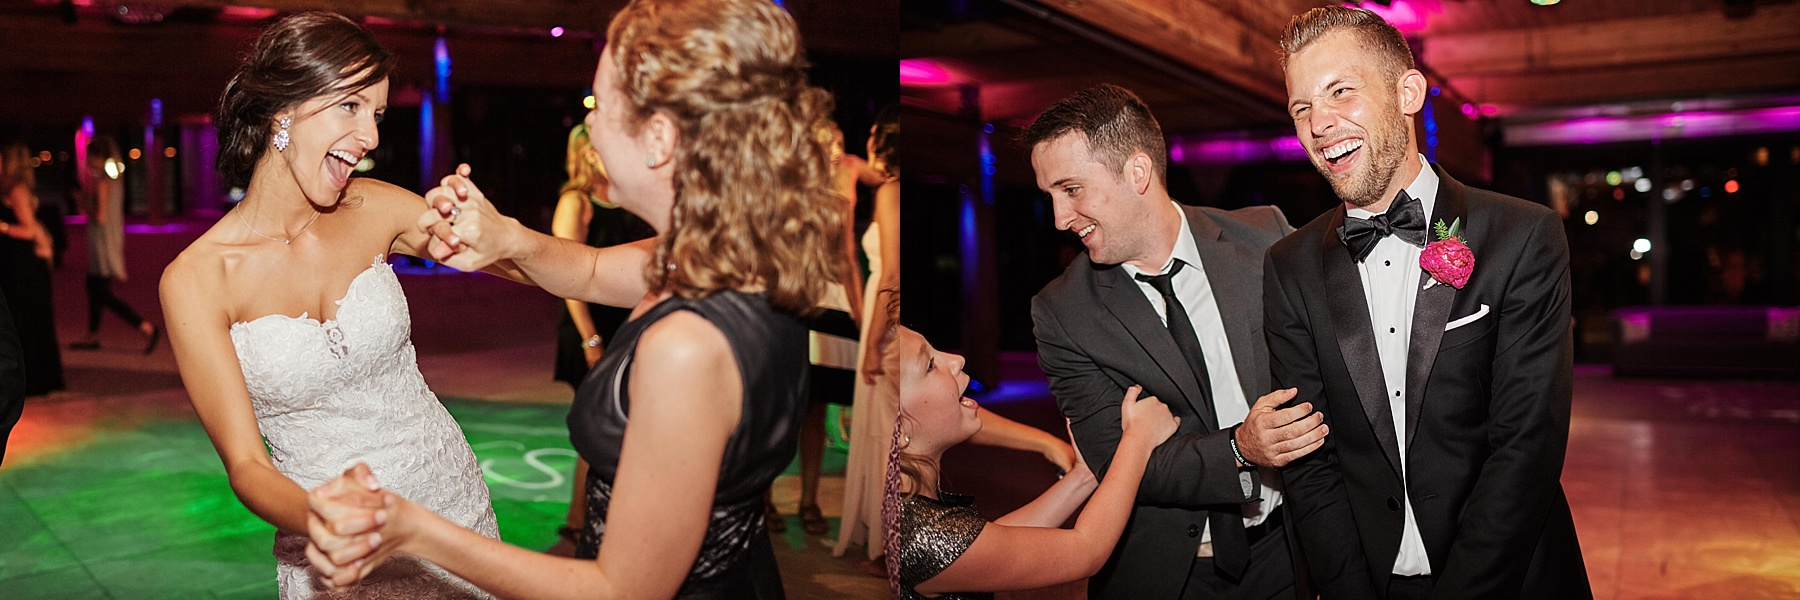 ABULAE-Wedding-Saint-paul-MN-Josh-Sofia-Wedding-Mears-Park_0860.jpg